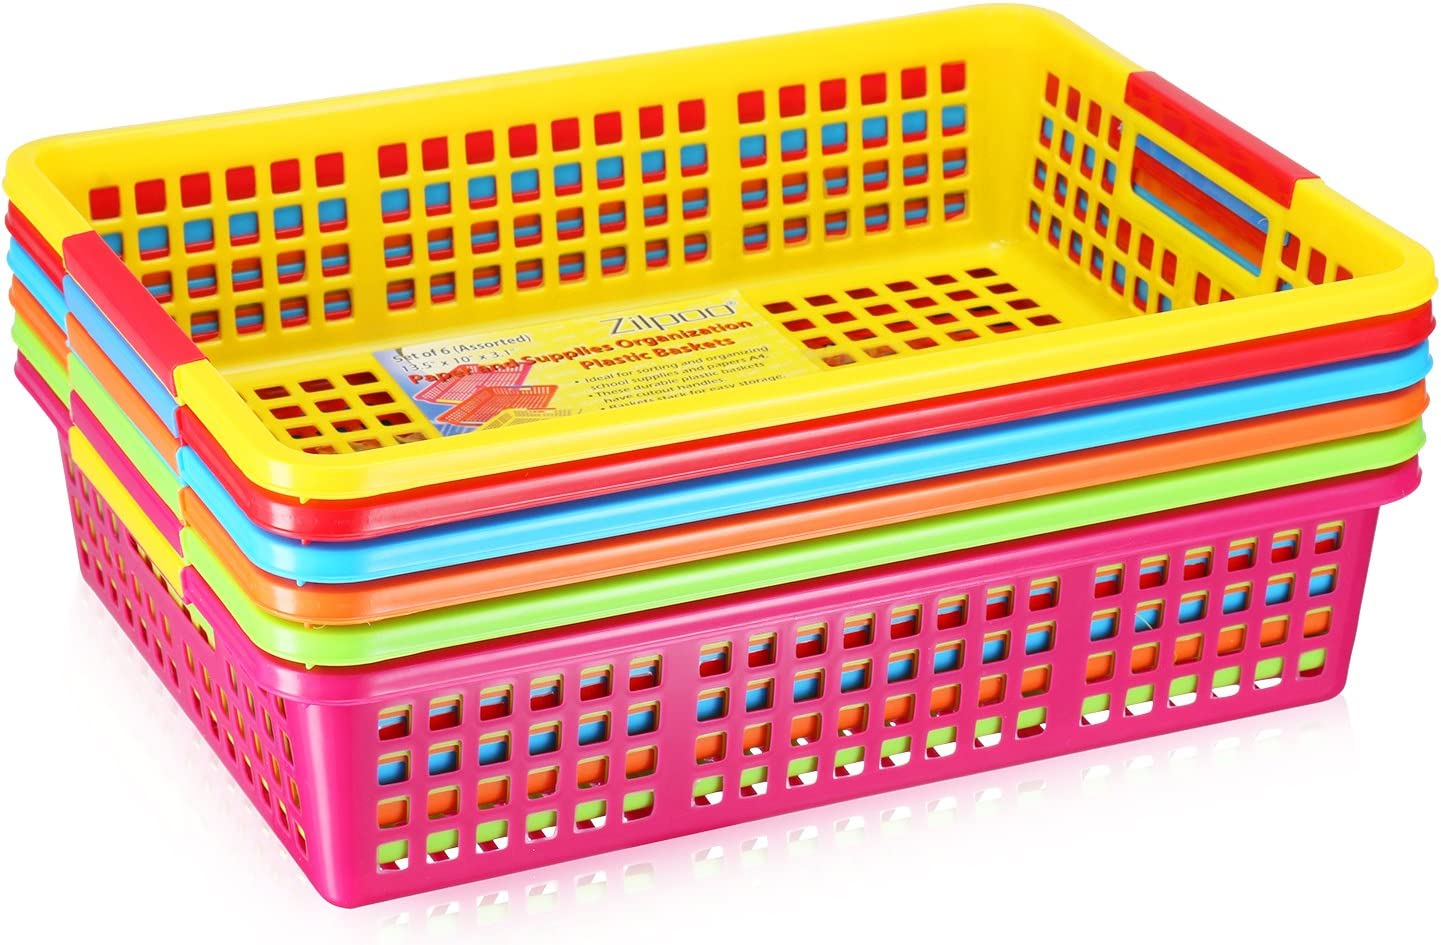 Closet Shelves Organization Trays Low School Zilpoo 10 Pack Plastic Shelf Bins